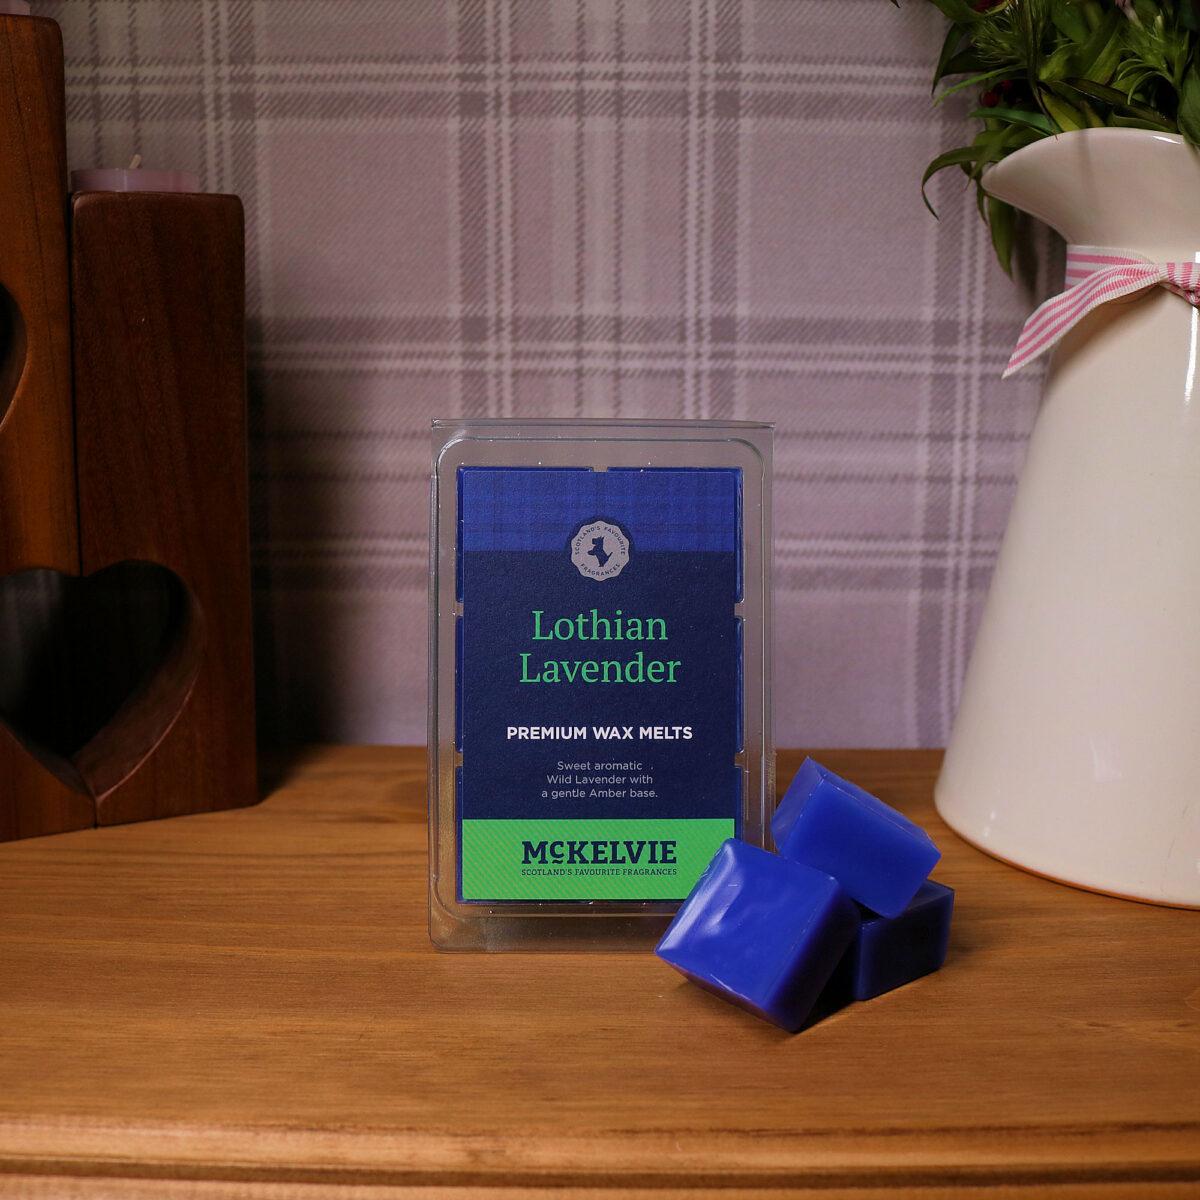 Lothian Lavender Wax Melts